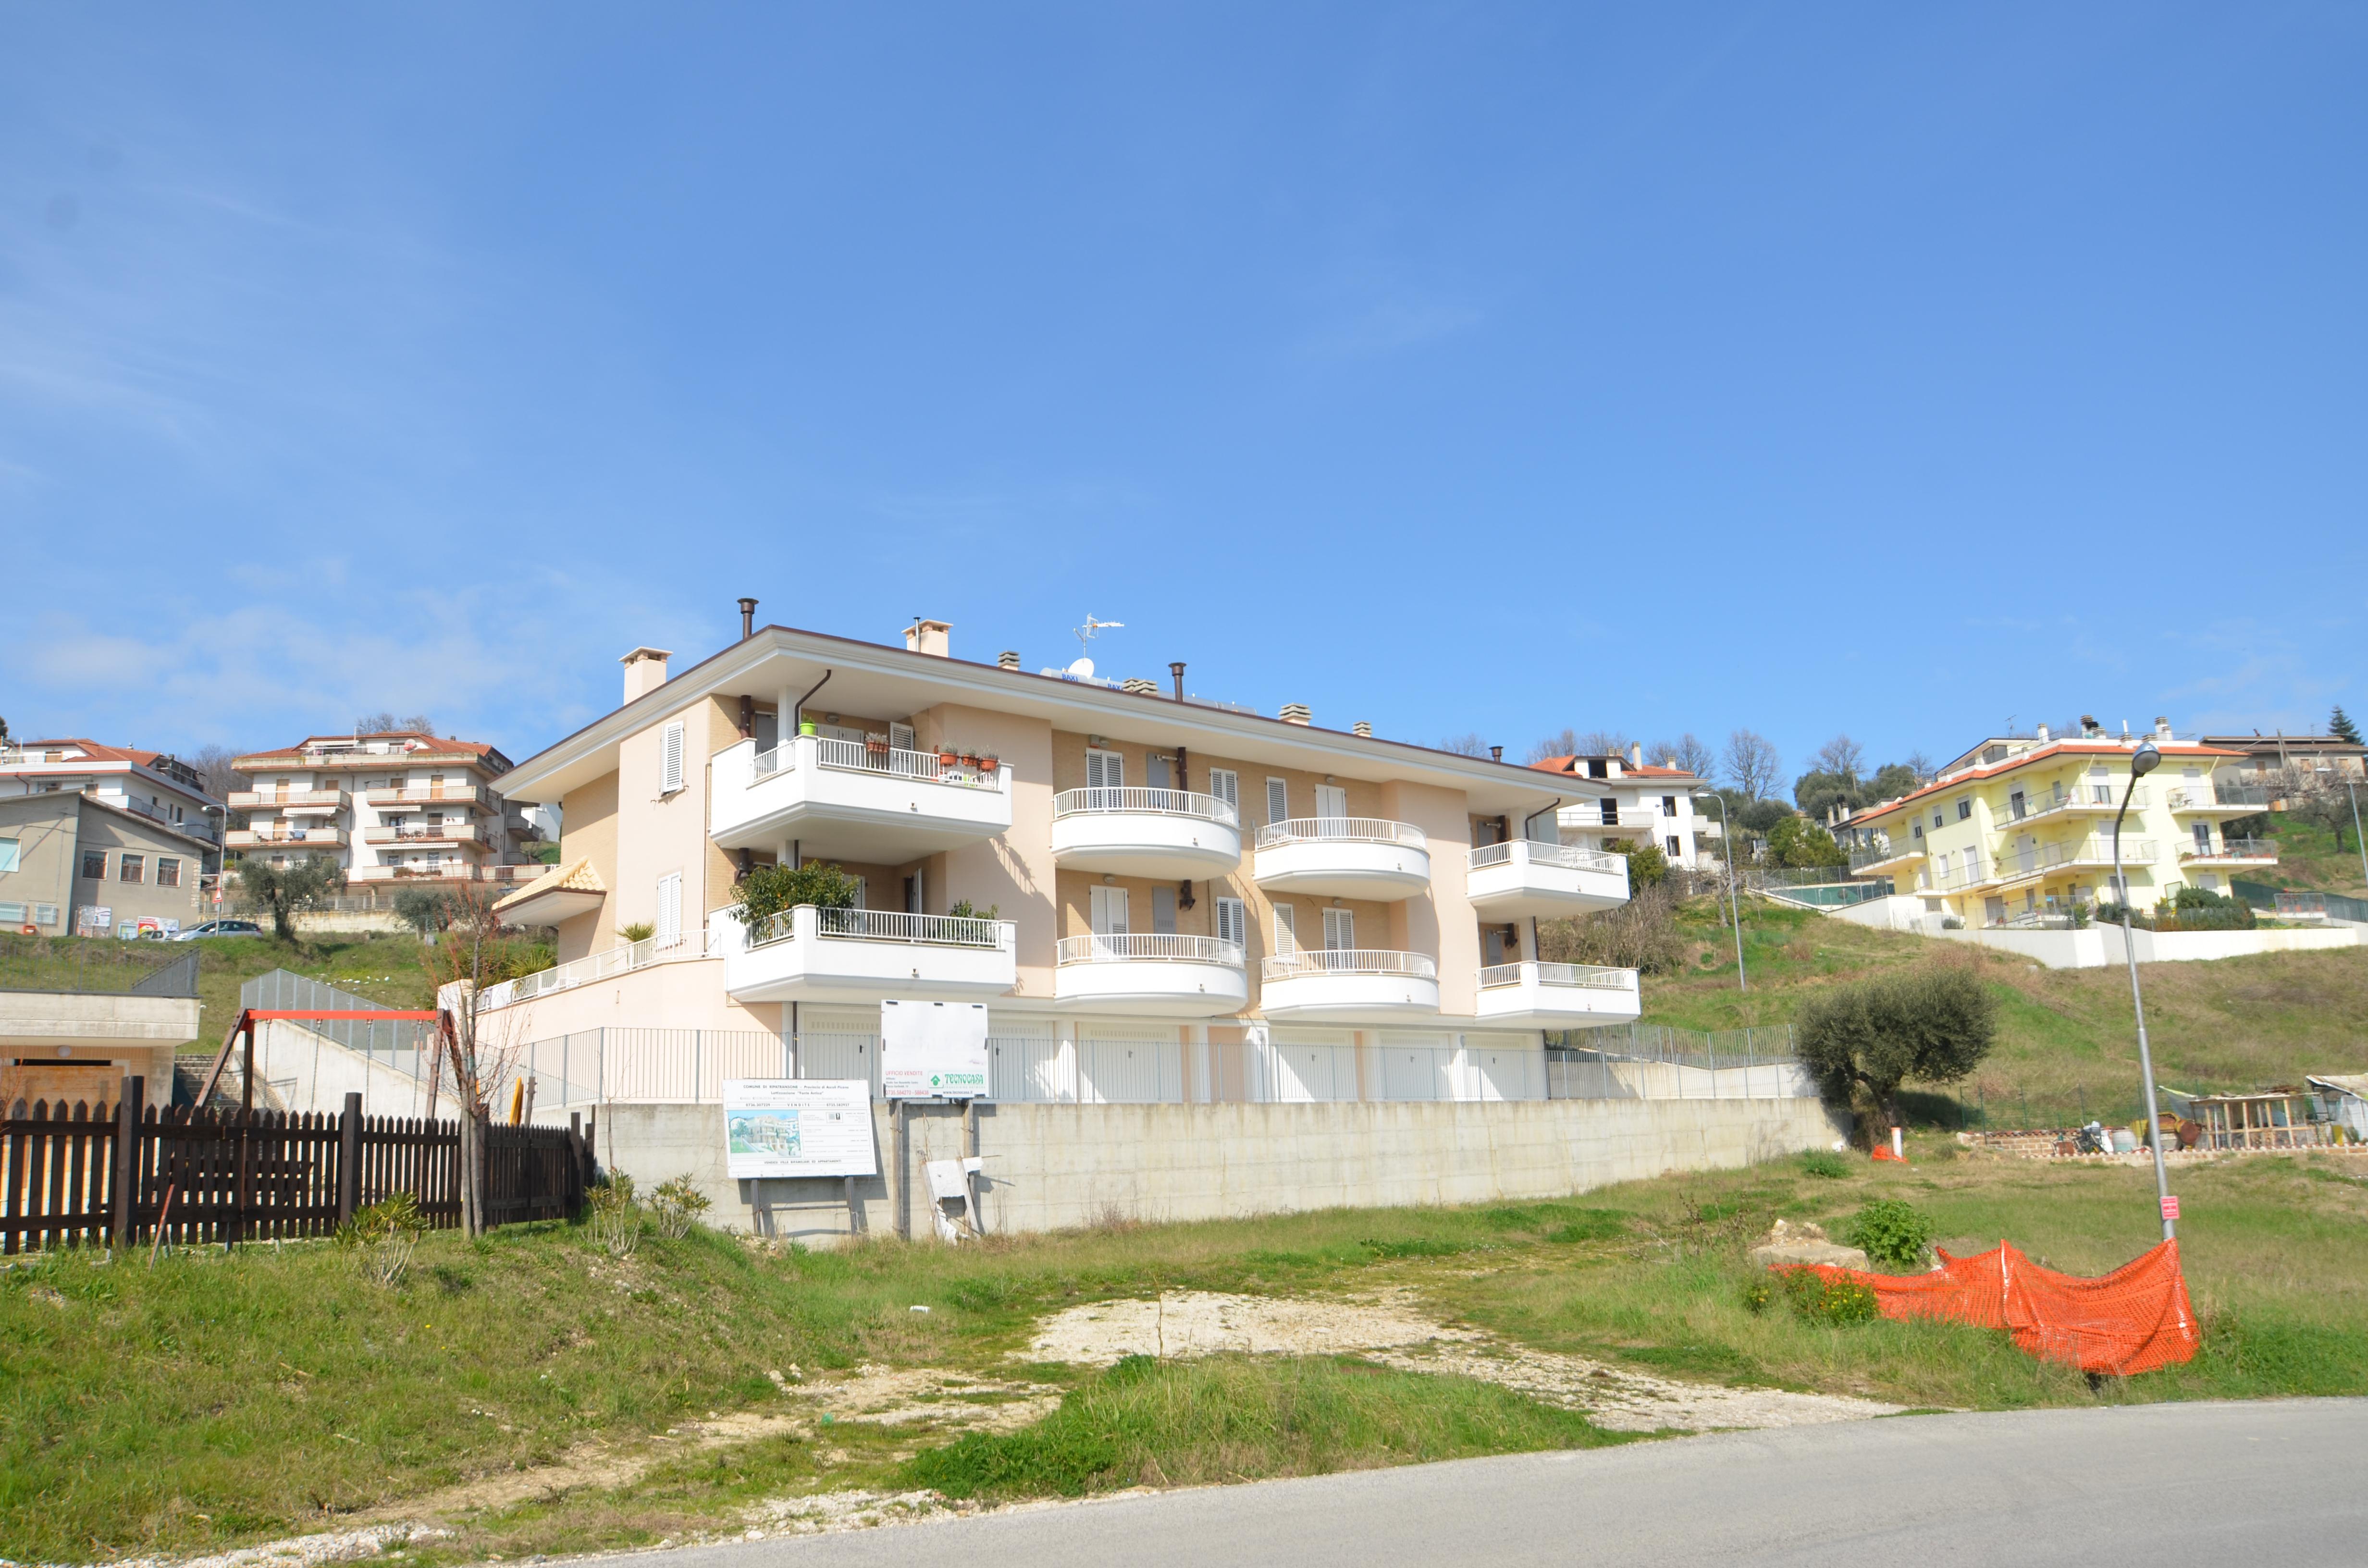 Appartamento nuovo a Ripatransone - san savino - 01